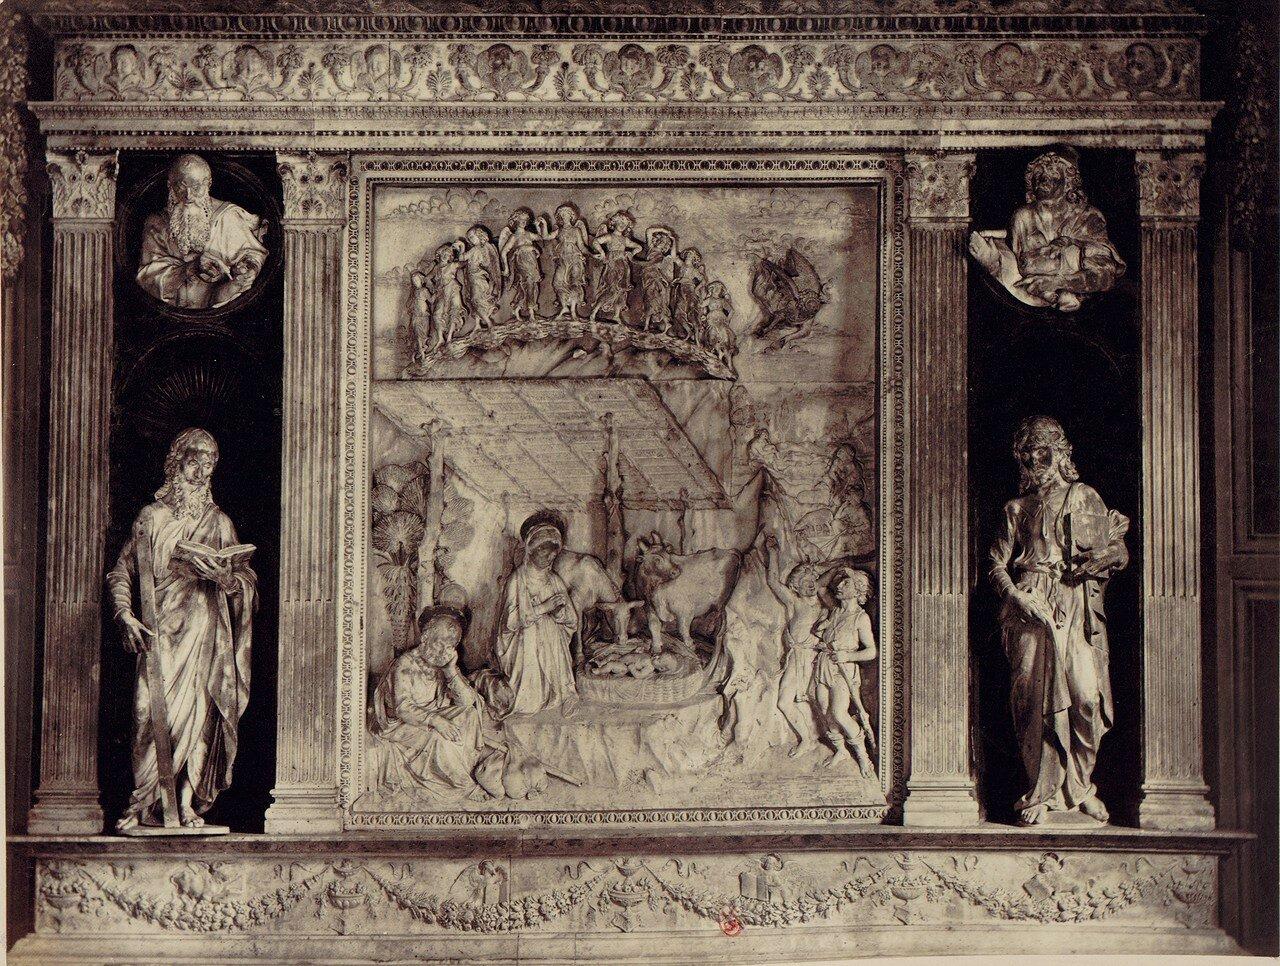 28. Церковь святой Анны. Скульптуры хора